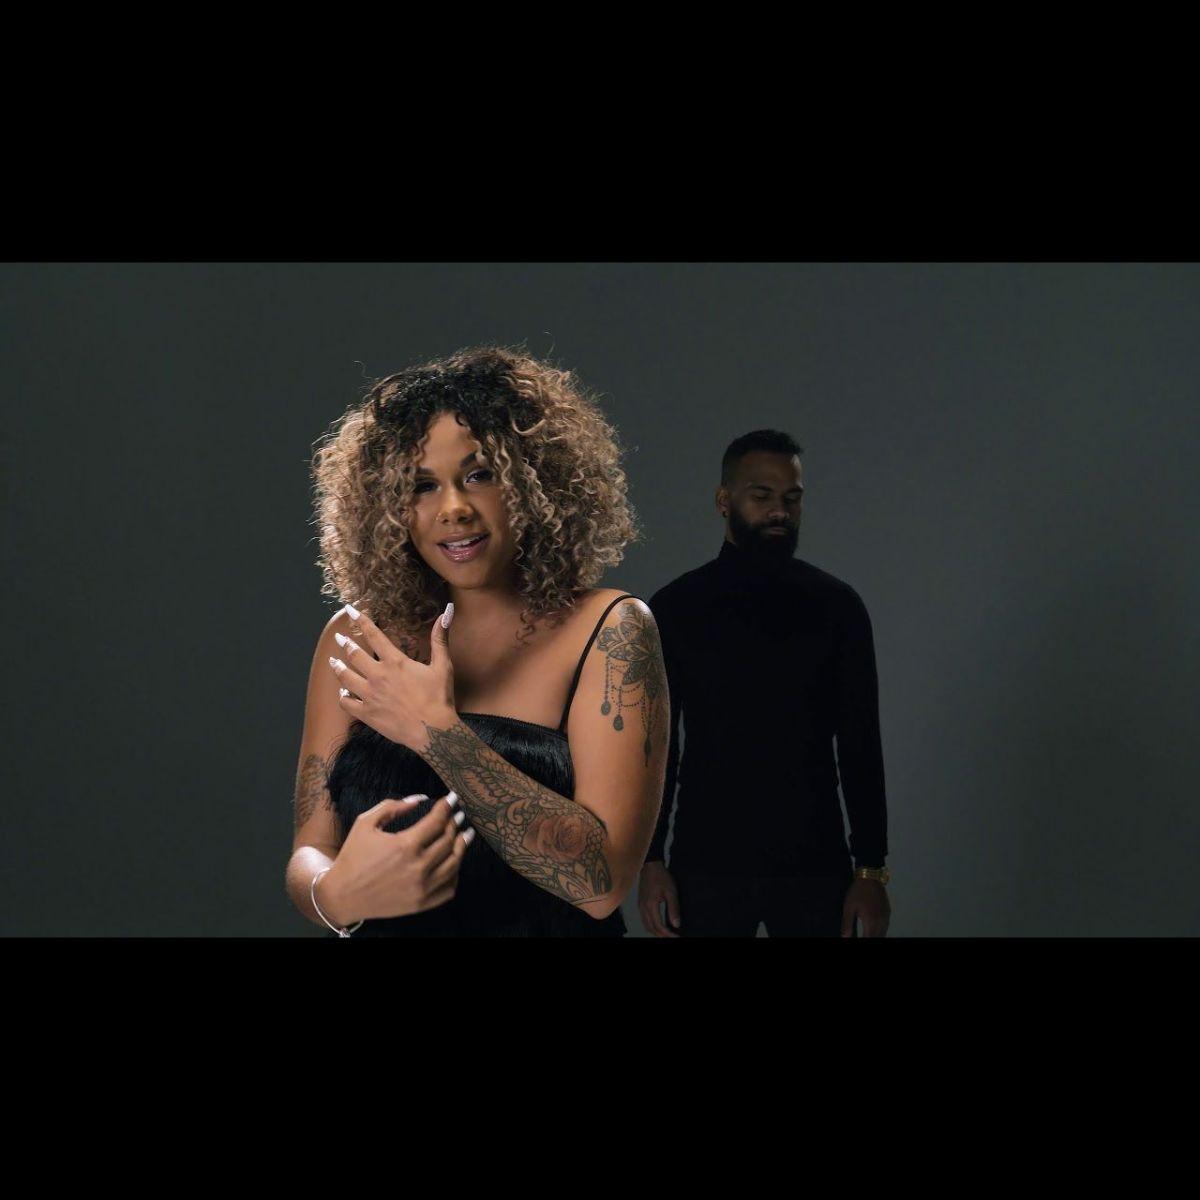 Érica Boaventura - Escolho-te a ti (ft. Yasmine) (Thumbnail)